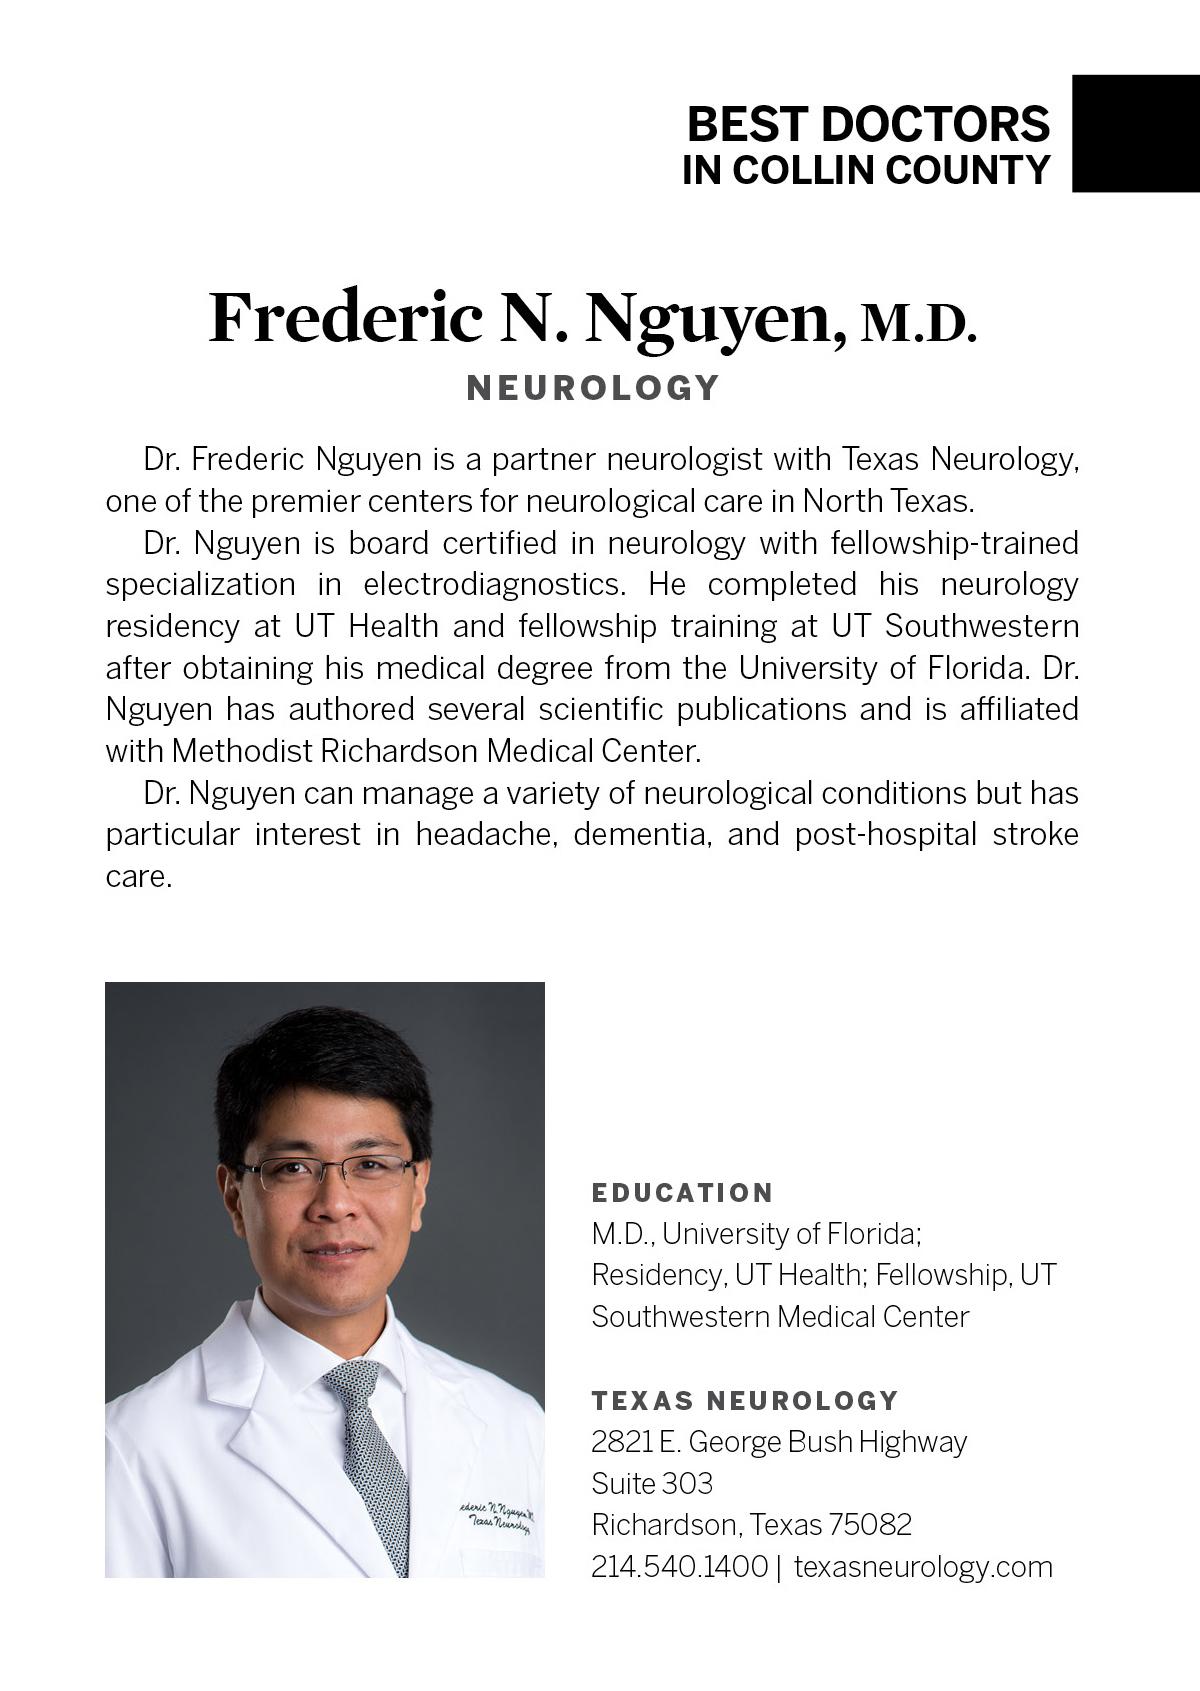 Frederic N  Nguyen, M D  - Neurology - Dallas | D Magazine